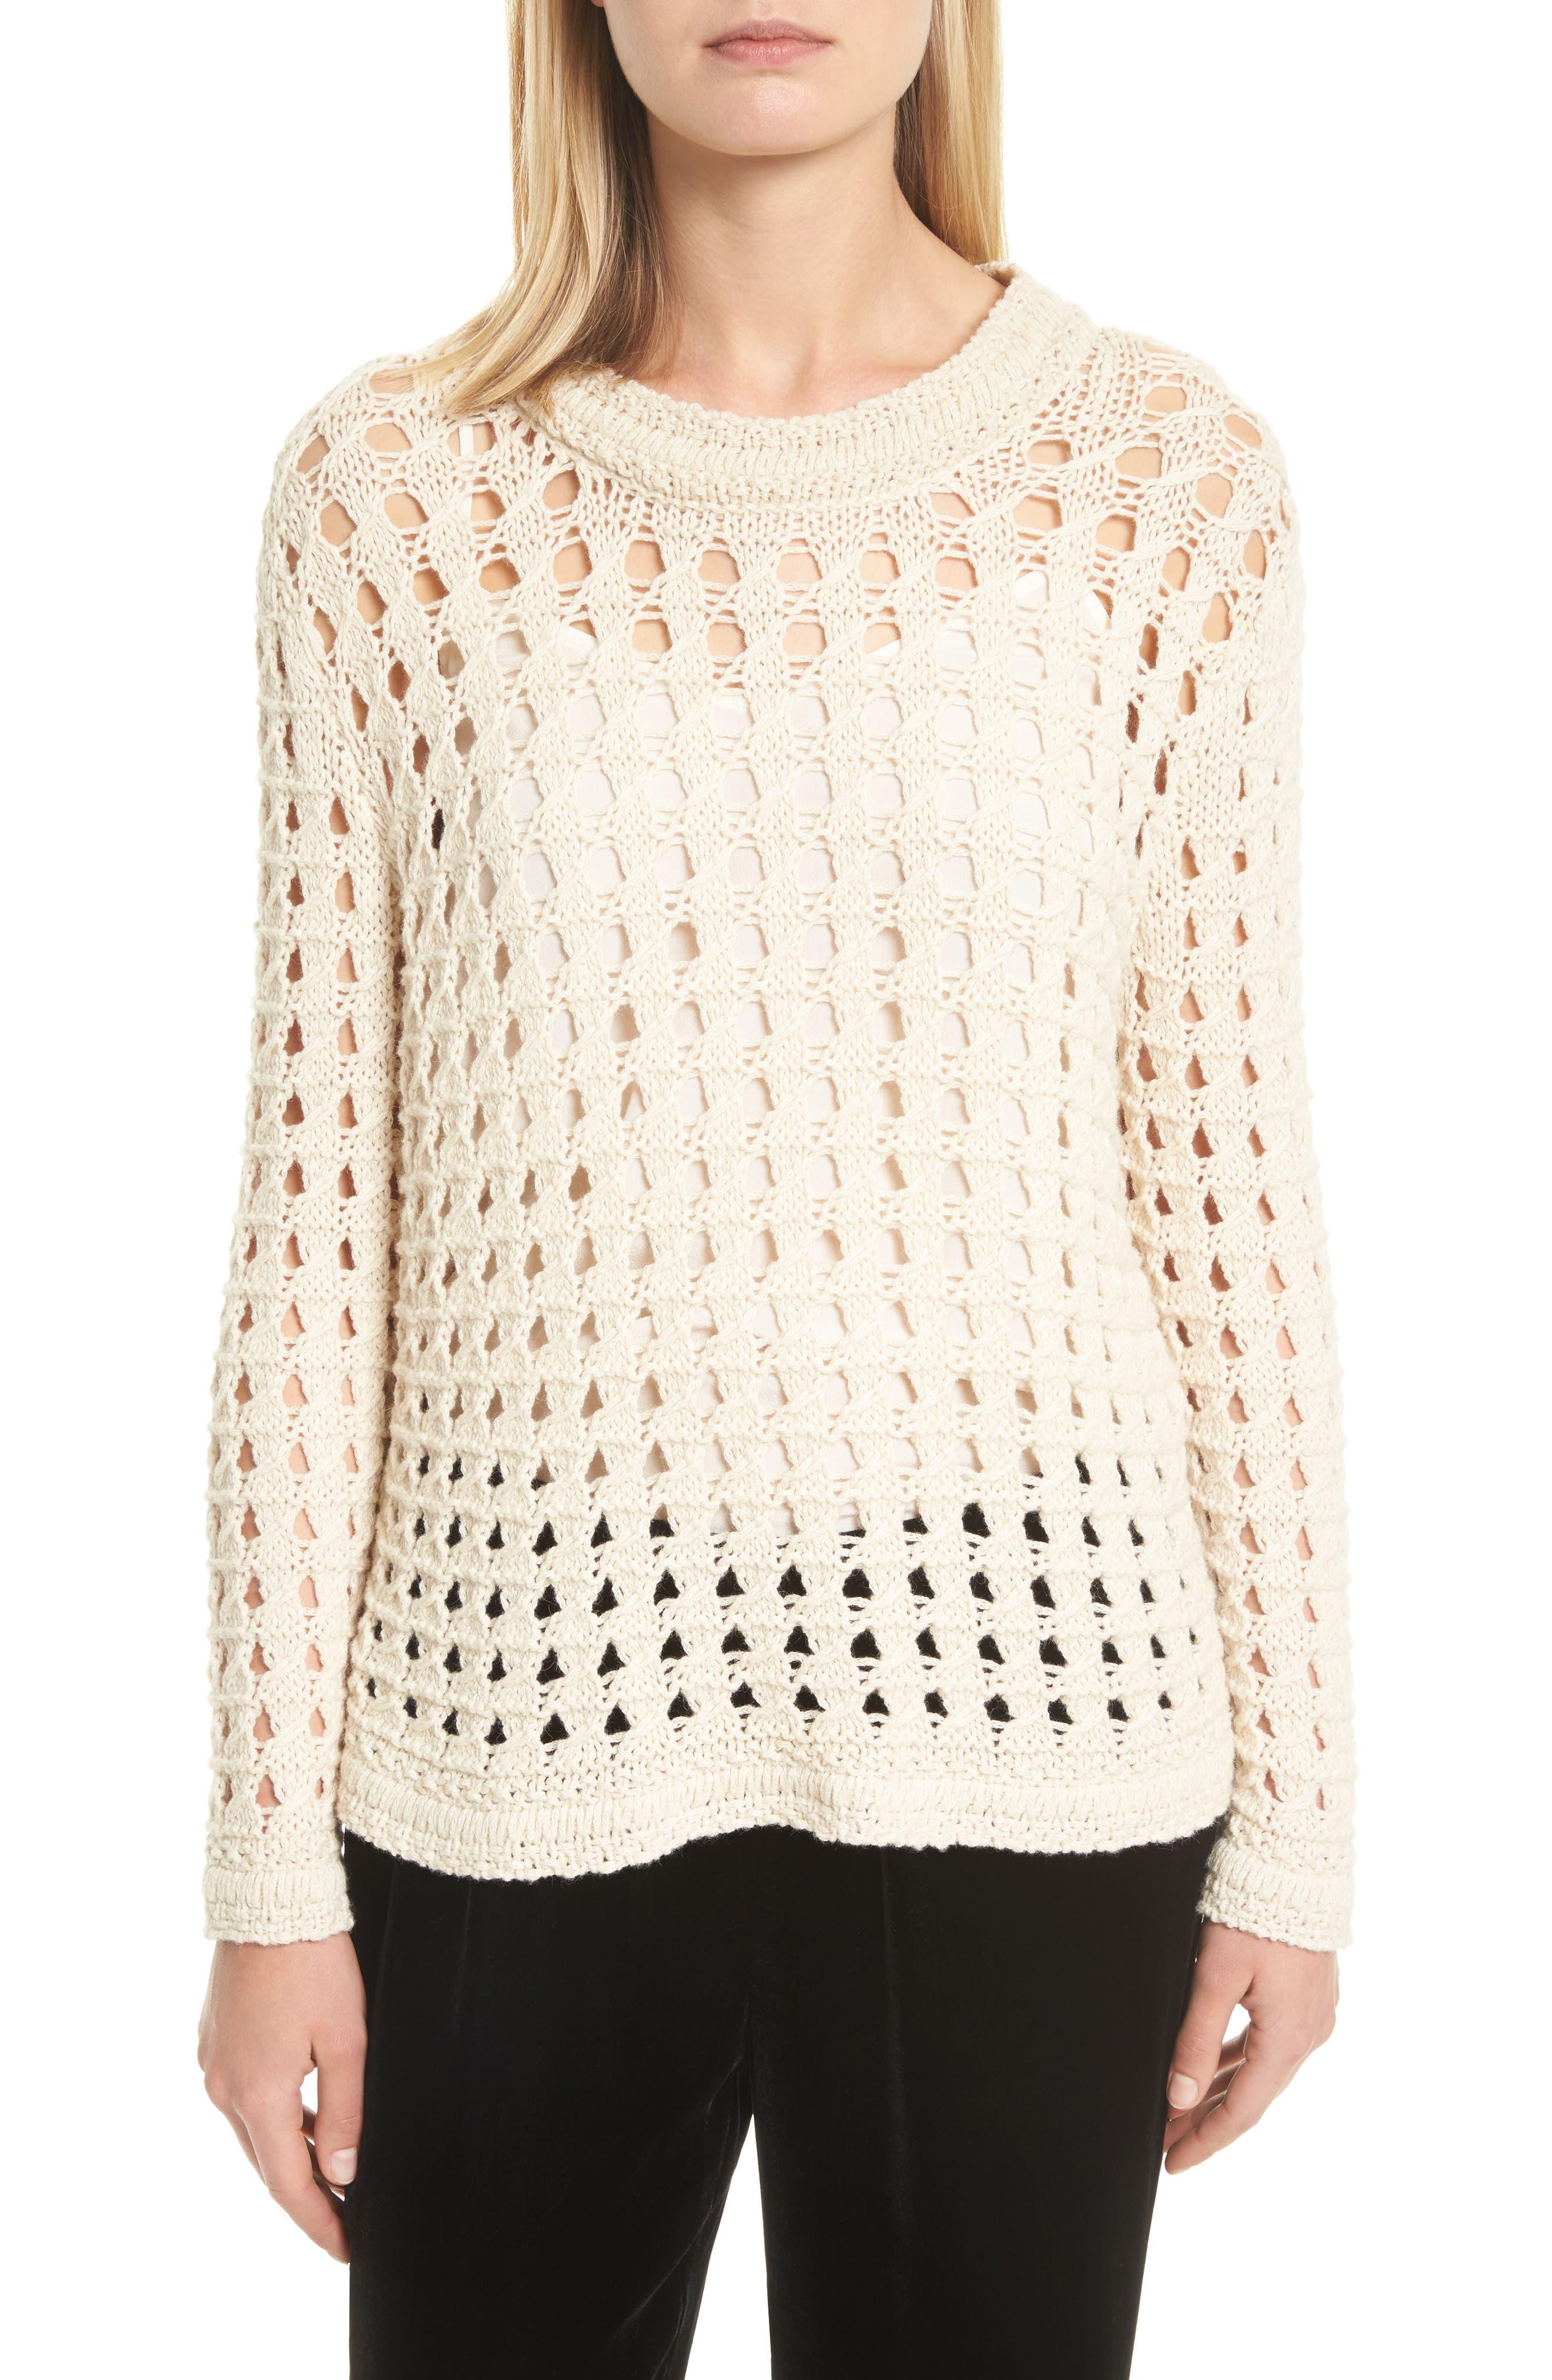 Joie Macha Open Stitch Cotton & Alpaca Sweater